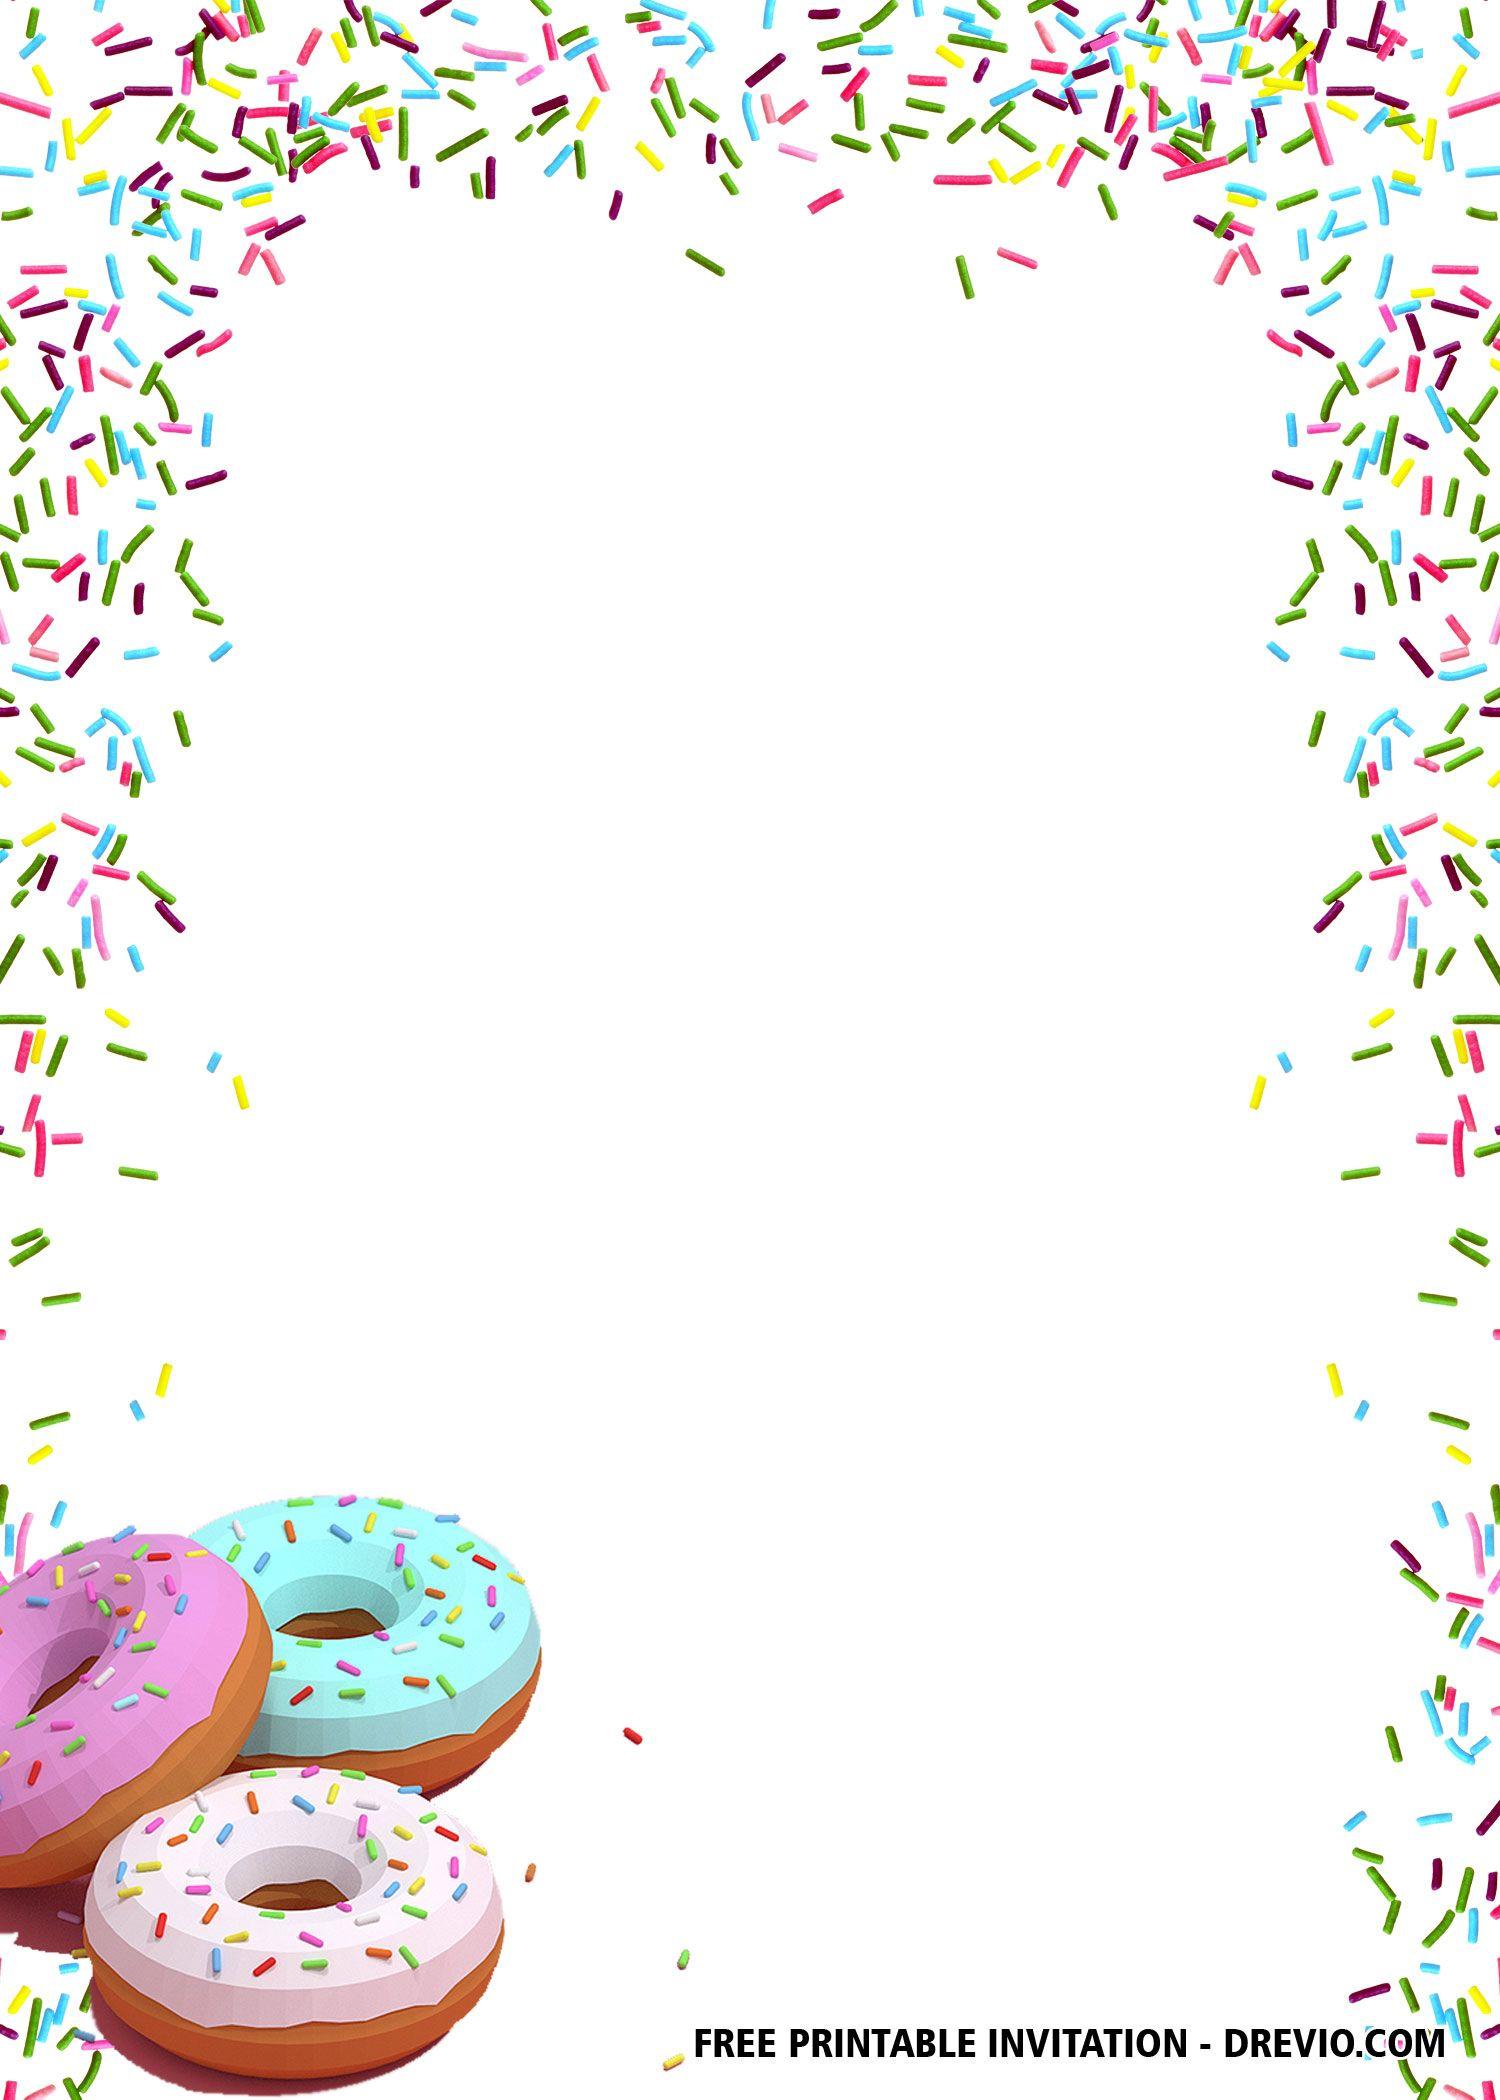 Free Donut Themed Birthday Invitation Templates Free Printable Invitations Templates Free Birthday Invitation Templates Printable Birthday Invitations